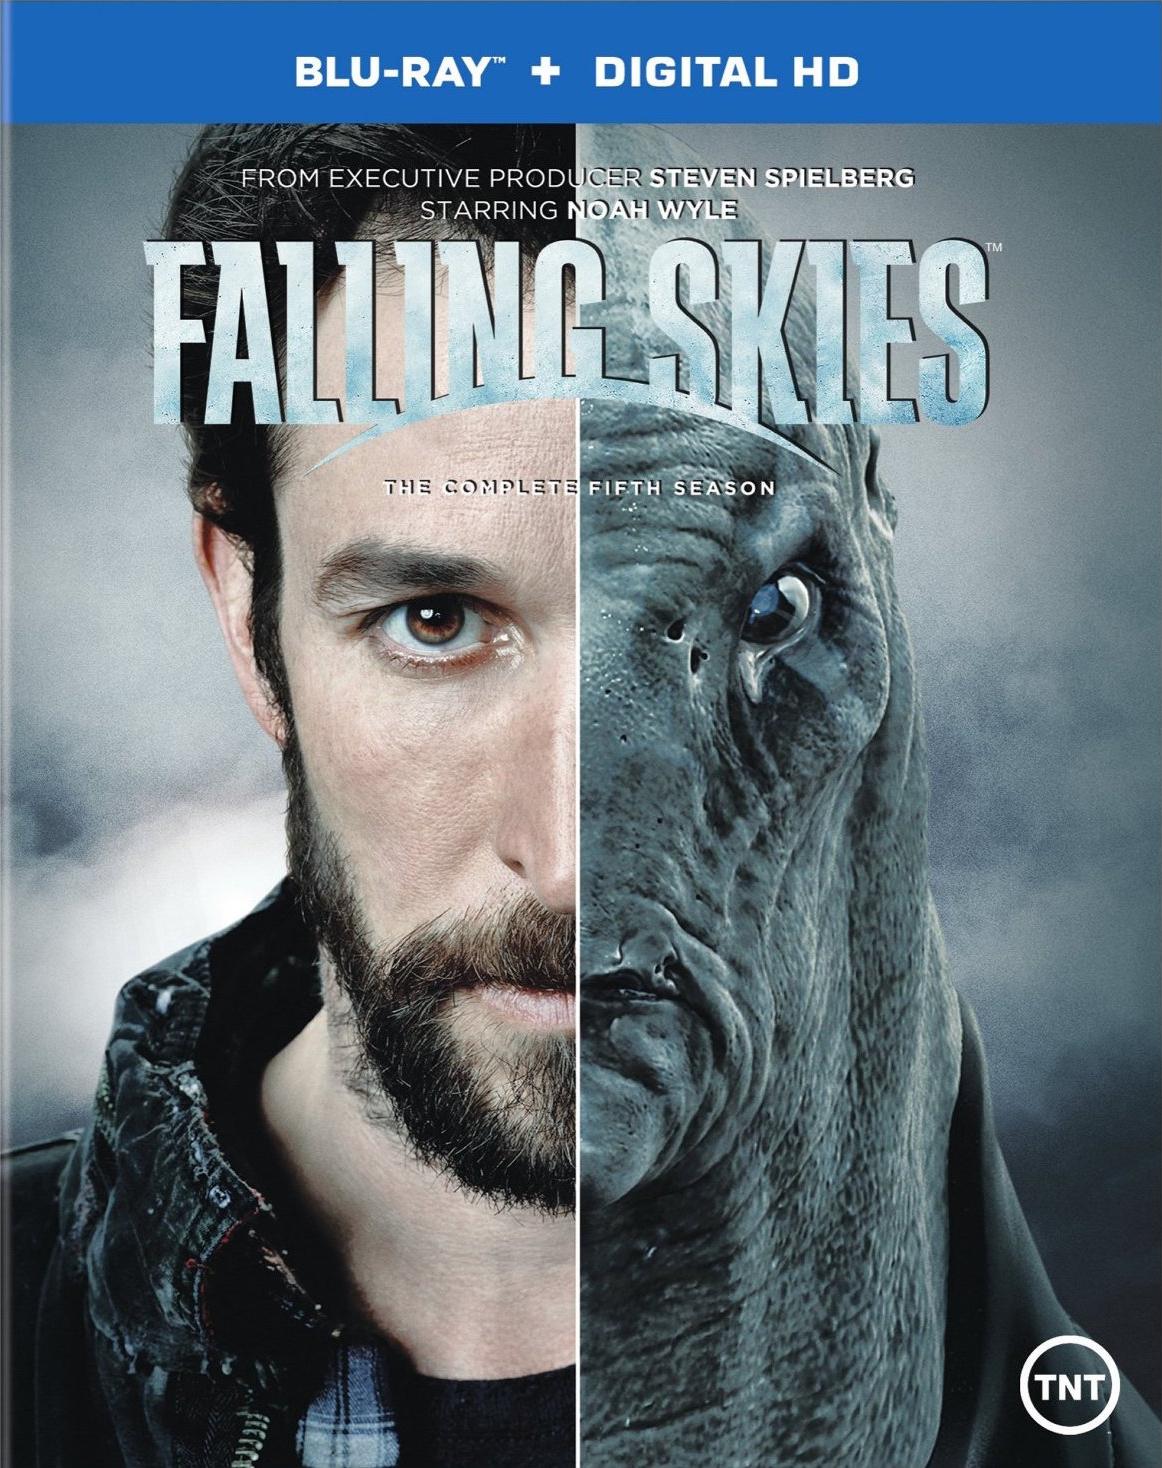 Falling Skies: The Complete Fifth Season (TV) (2015) Blu-ray